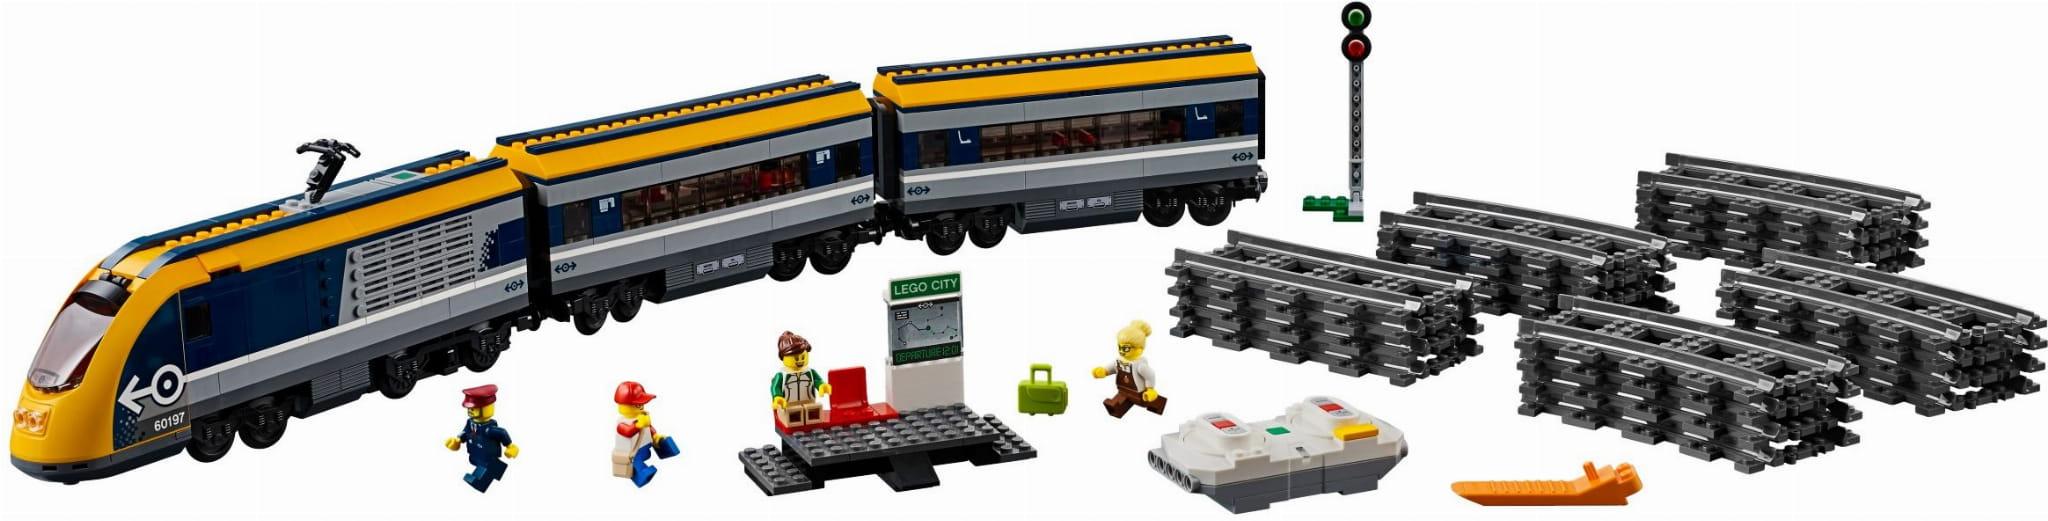 Lego City 60197 Pociąg Pasażerski Rcshop